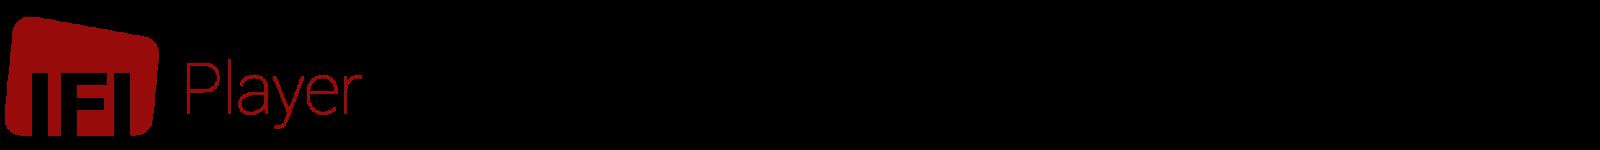 IFI Player logo